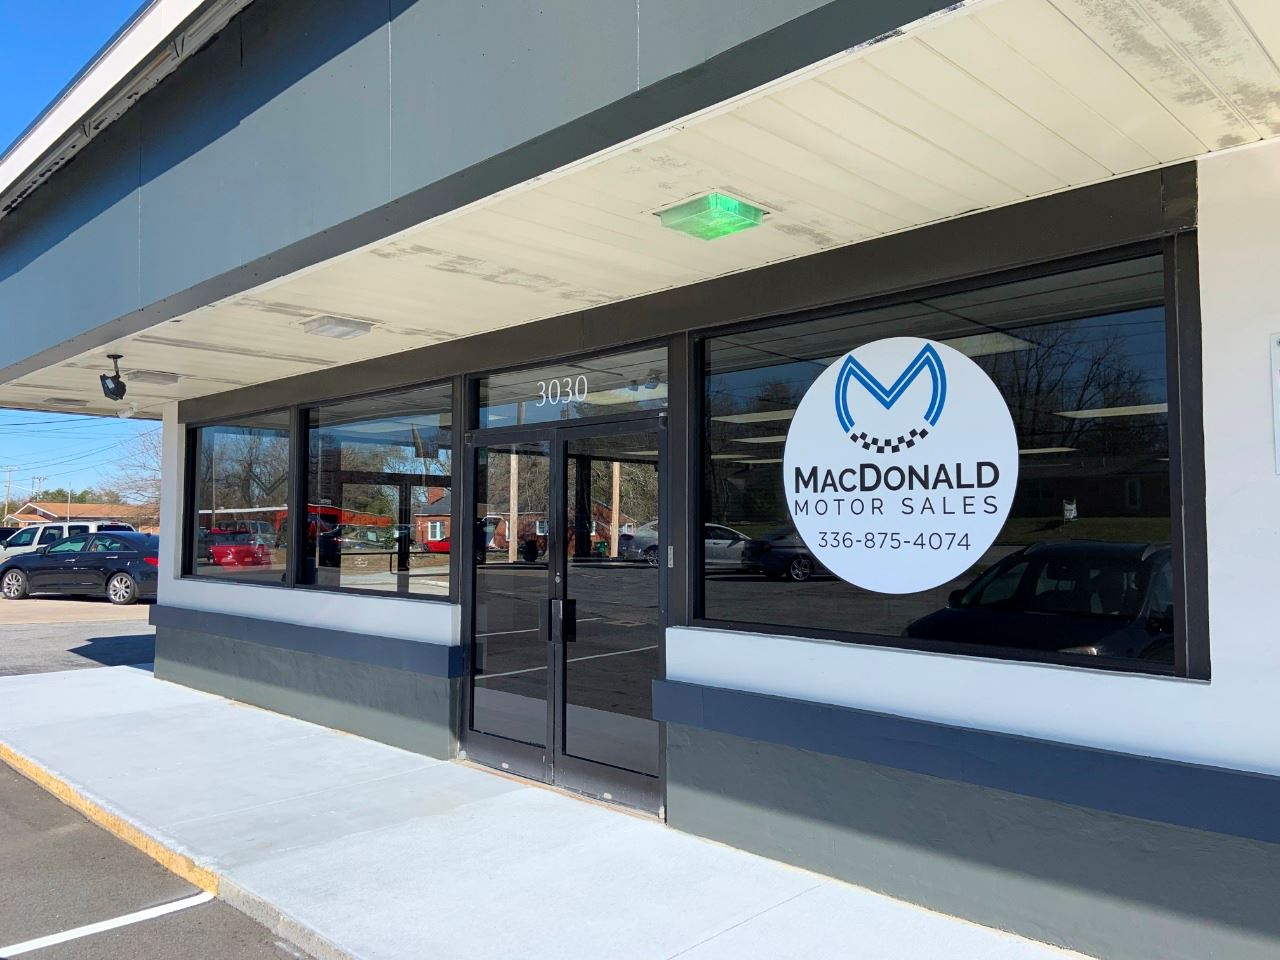 MacDonald Motor Sales